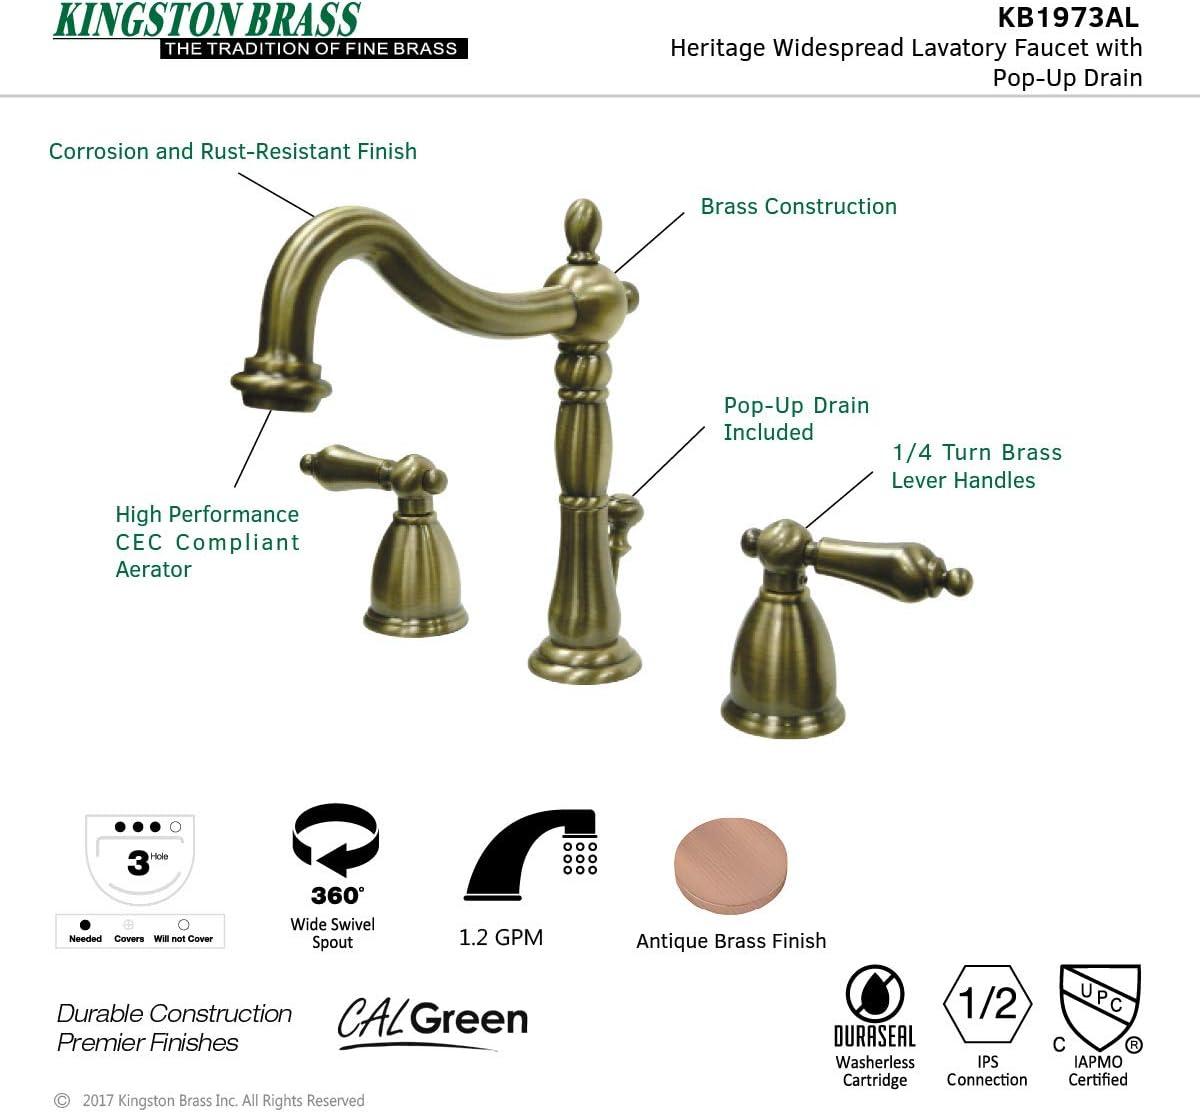 8 Vintage Brass Kingston Brass KB1973AL Heritage Widespread Lavatory Faucet